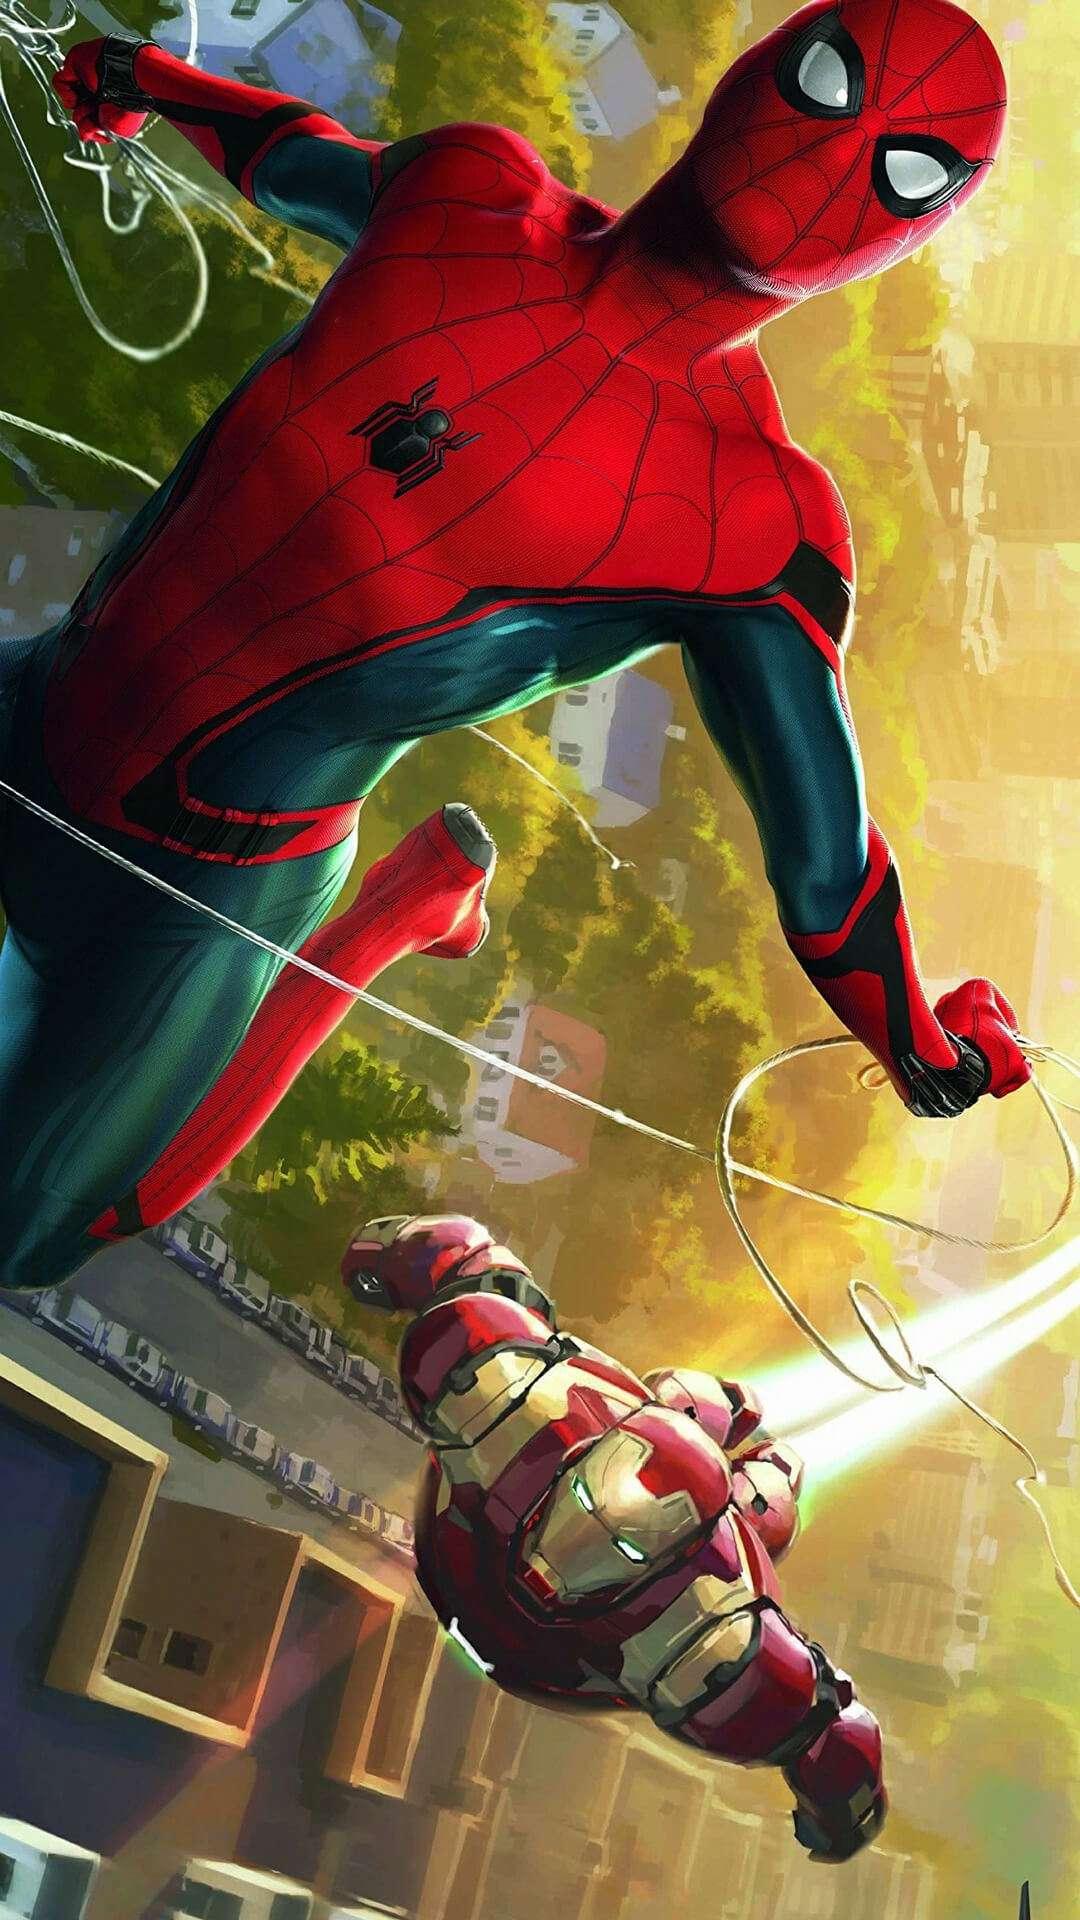 Spiderman iron man iphone wallpaper iphone wallpapers - Iron man spiderman wallpaper ...